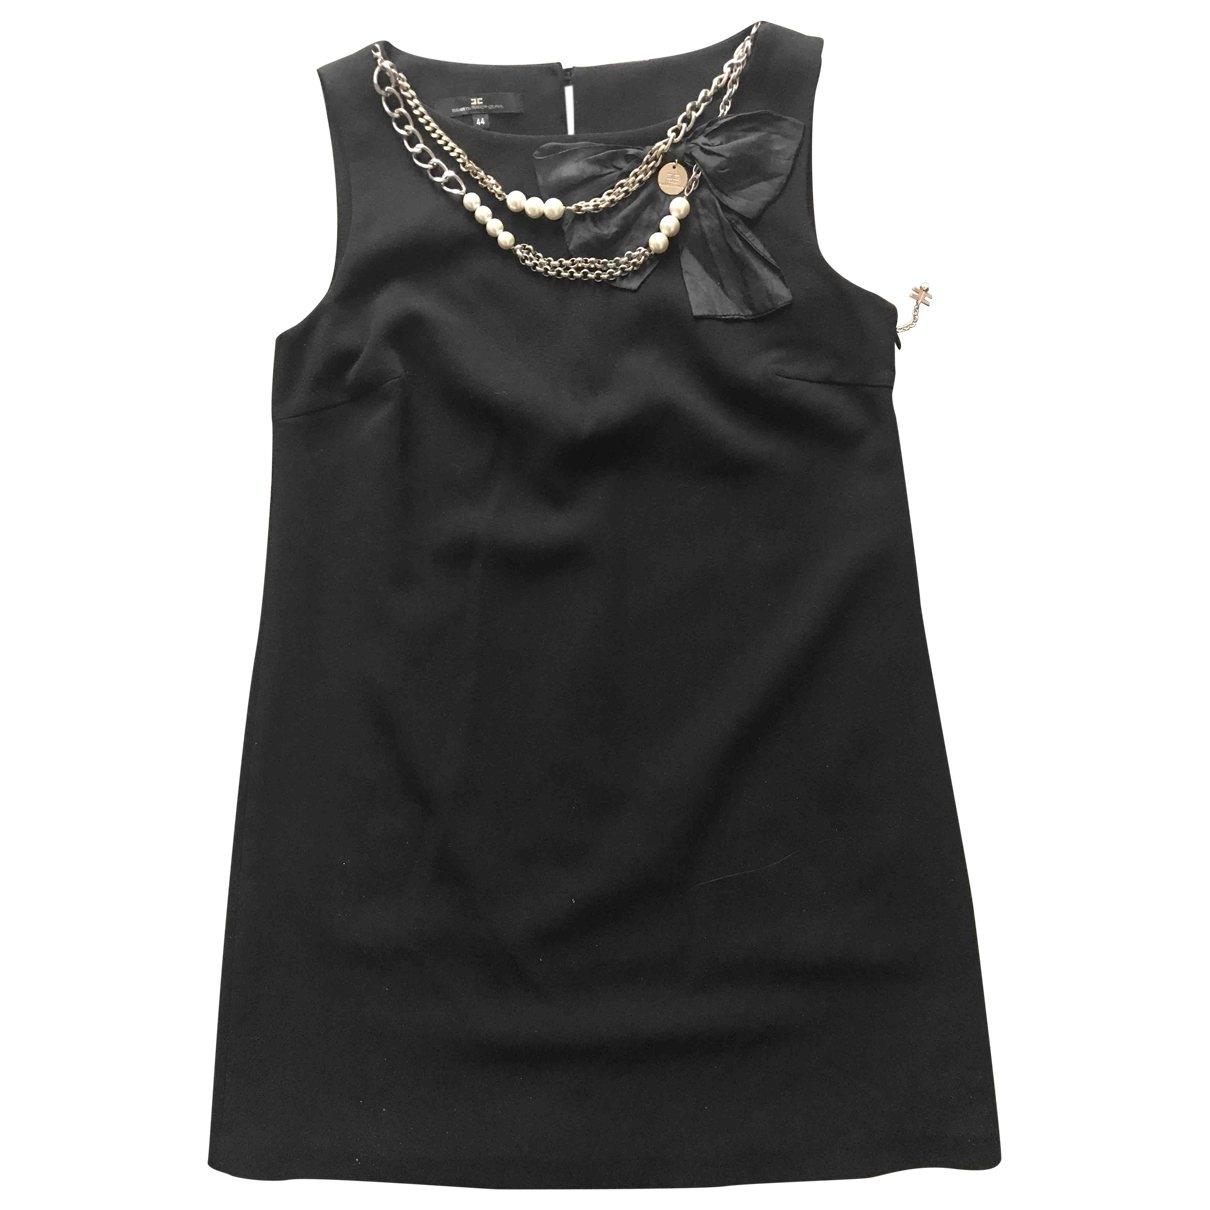 Elisabetta Franchi \N Black dress for Women 44 IT